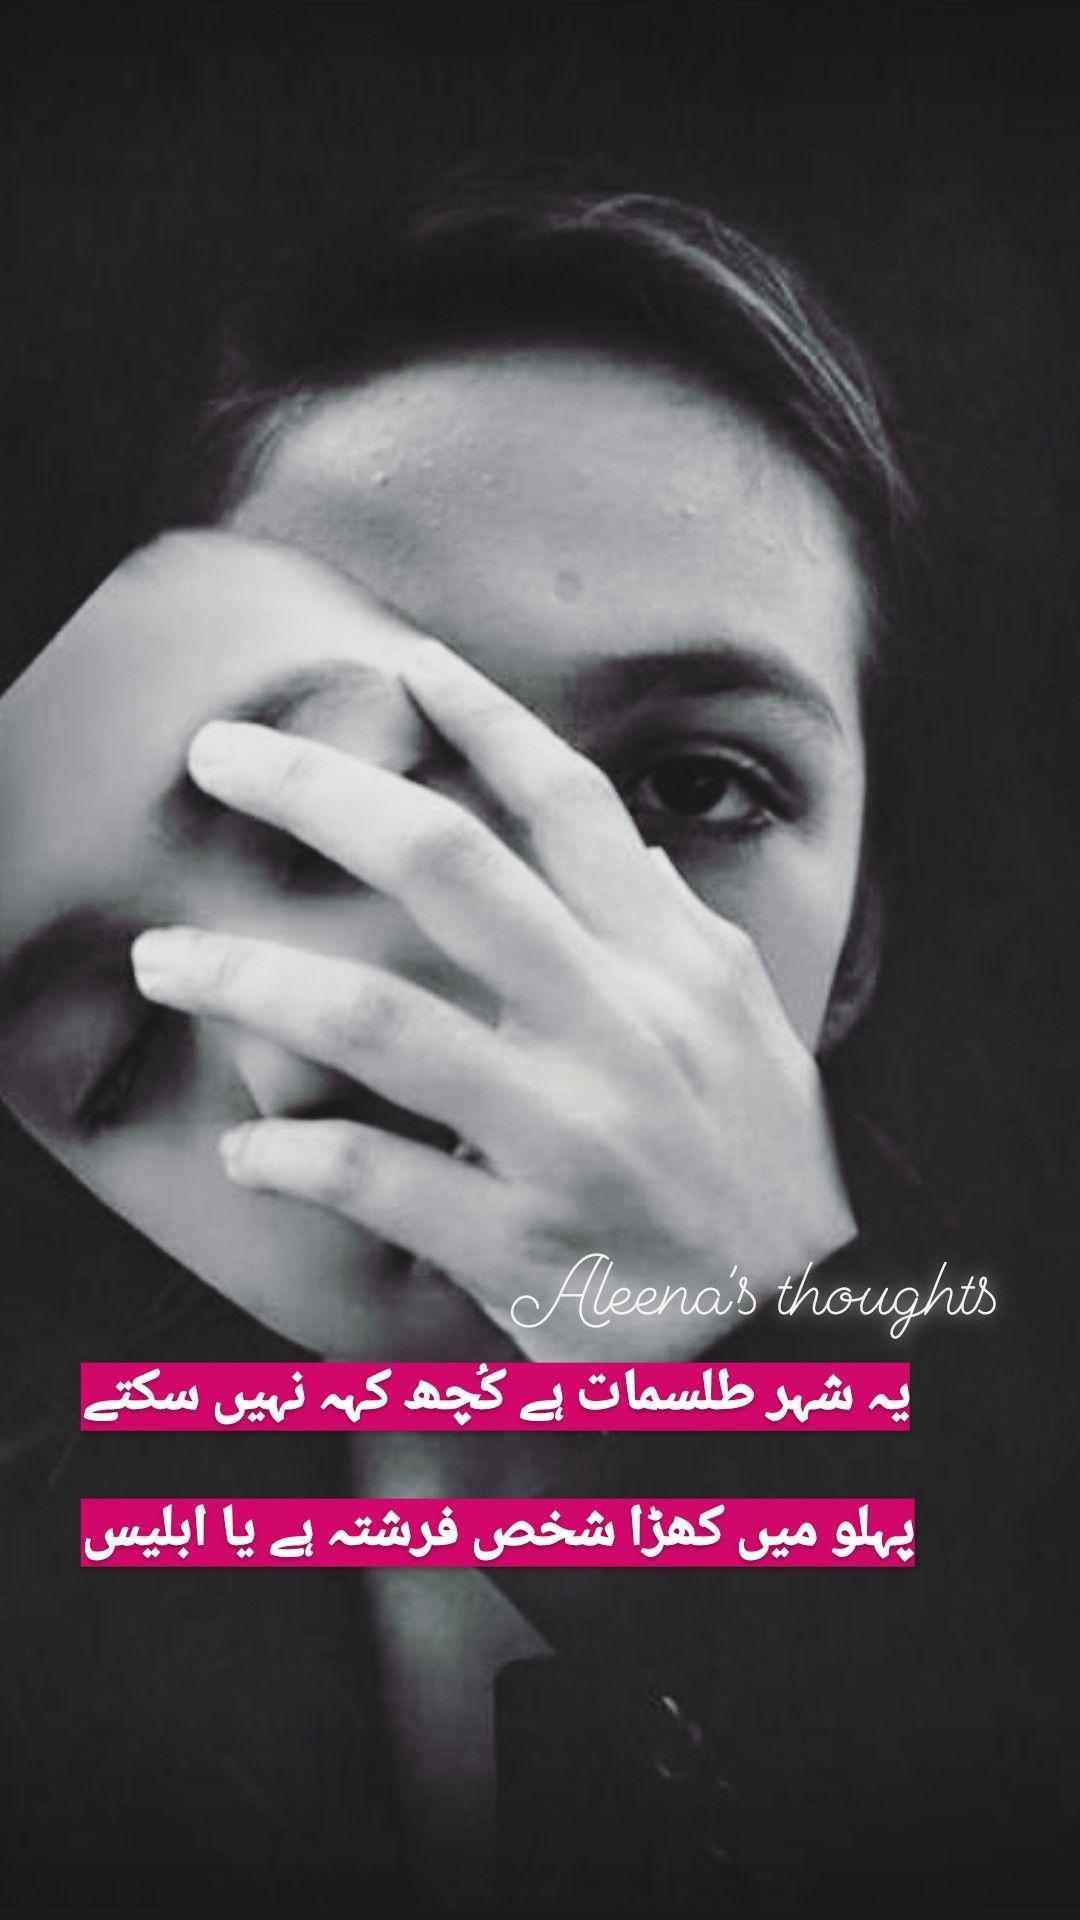 #amazing_urdu_poetry   Lines quotes, Urdu poetry, True words